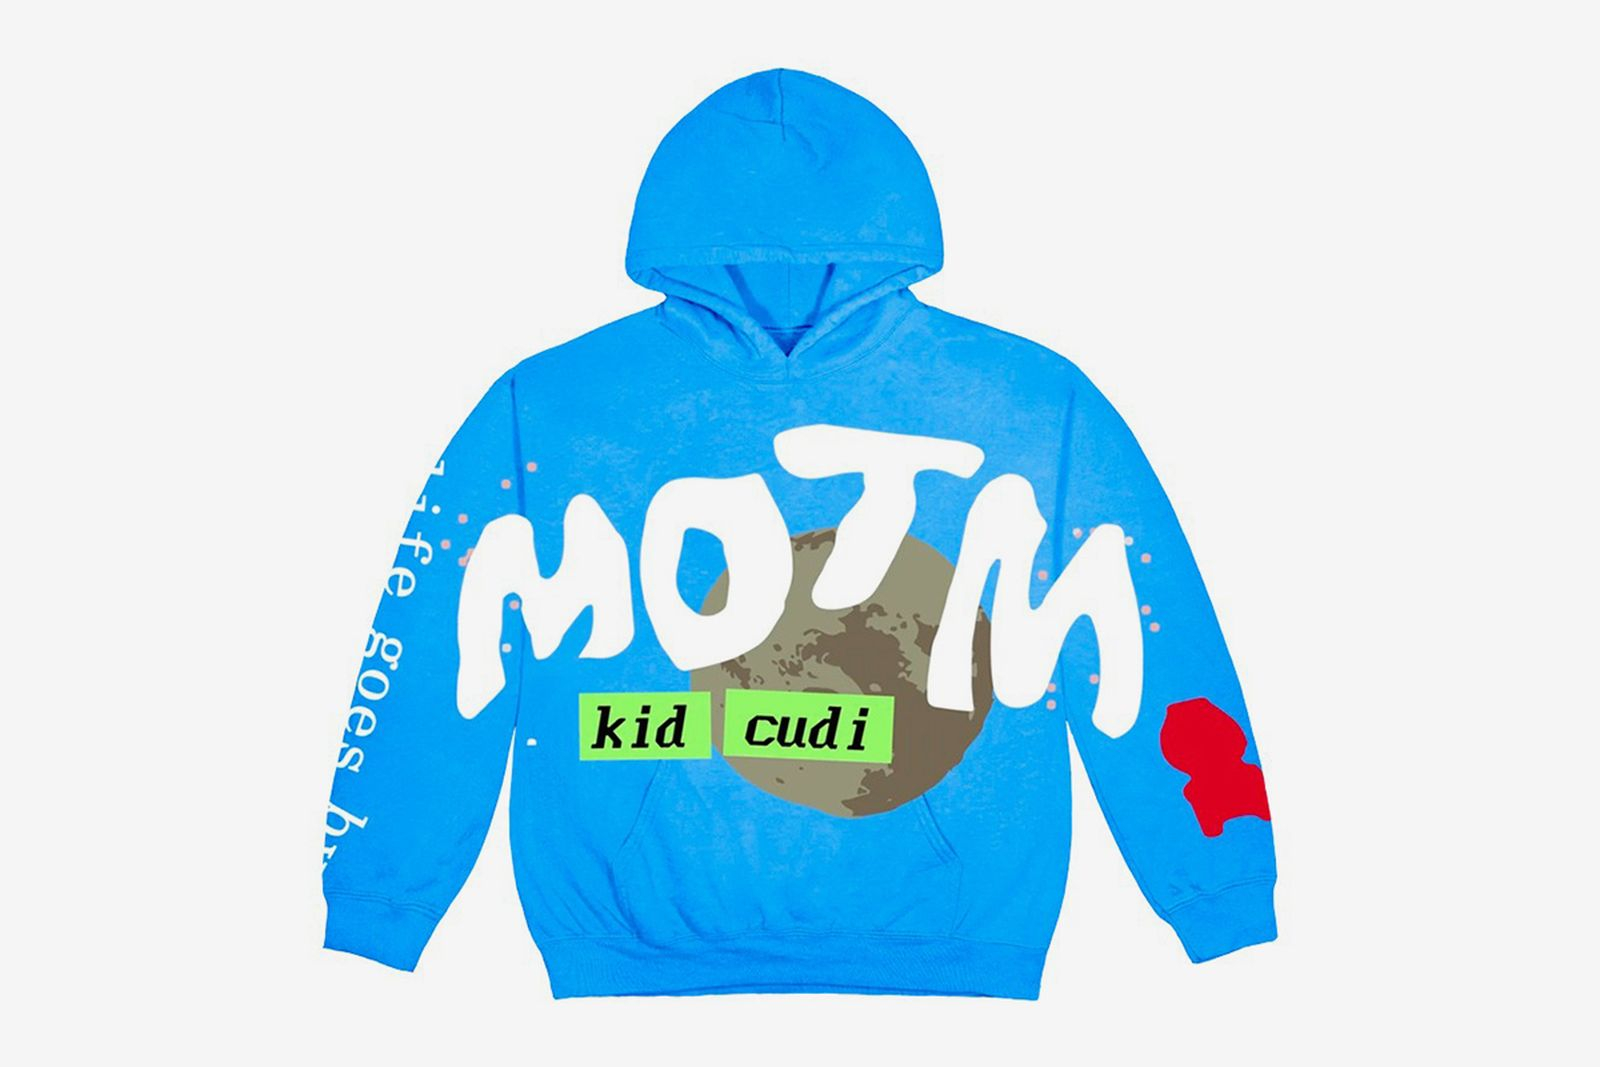 kid-cudi-cactus-plant-flea-market-motm-iii-merch-01